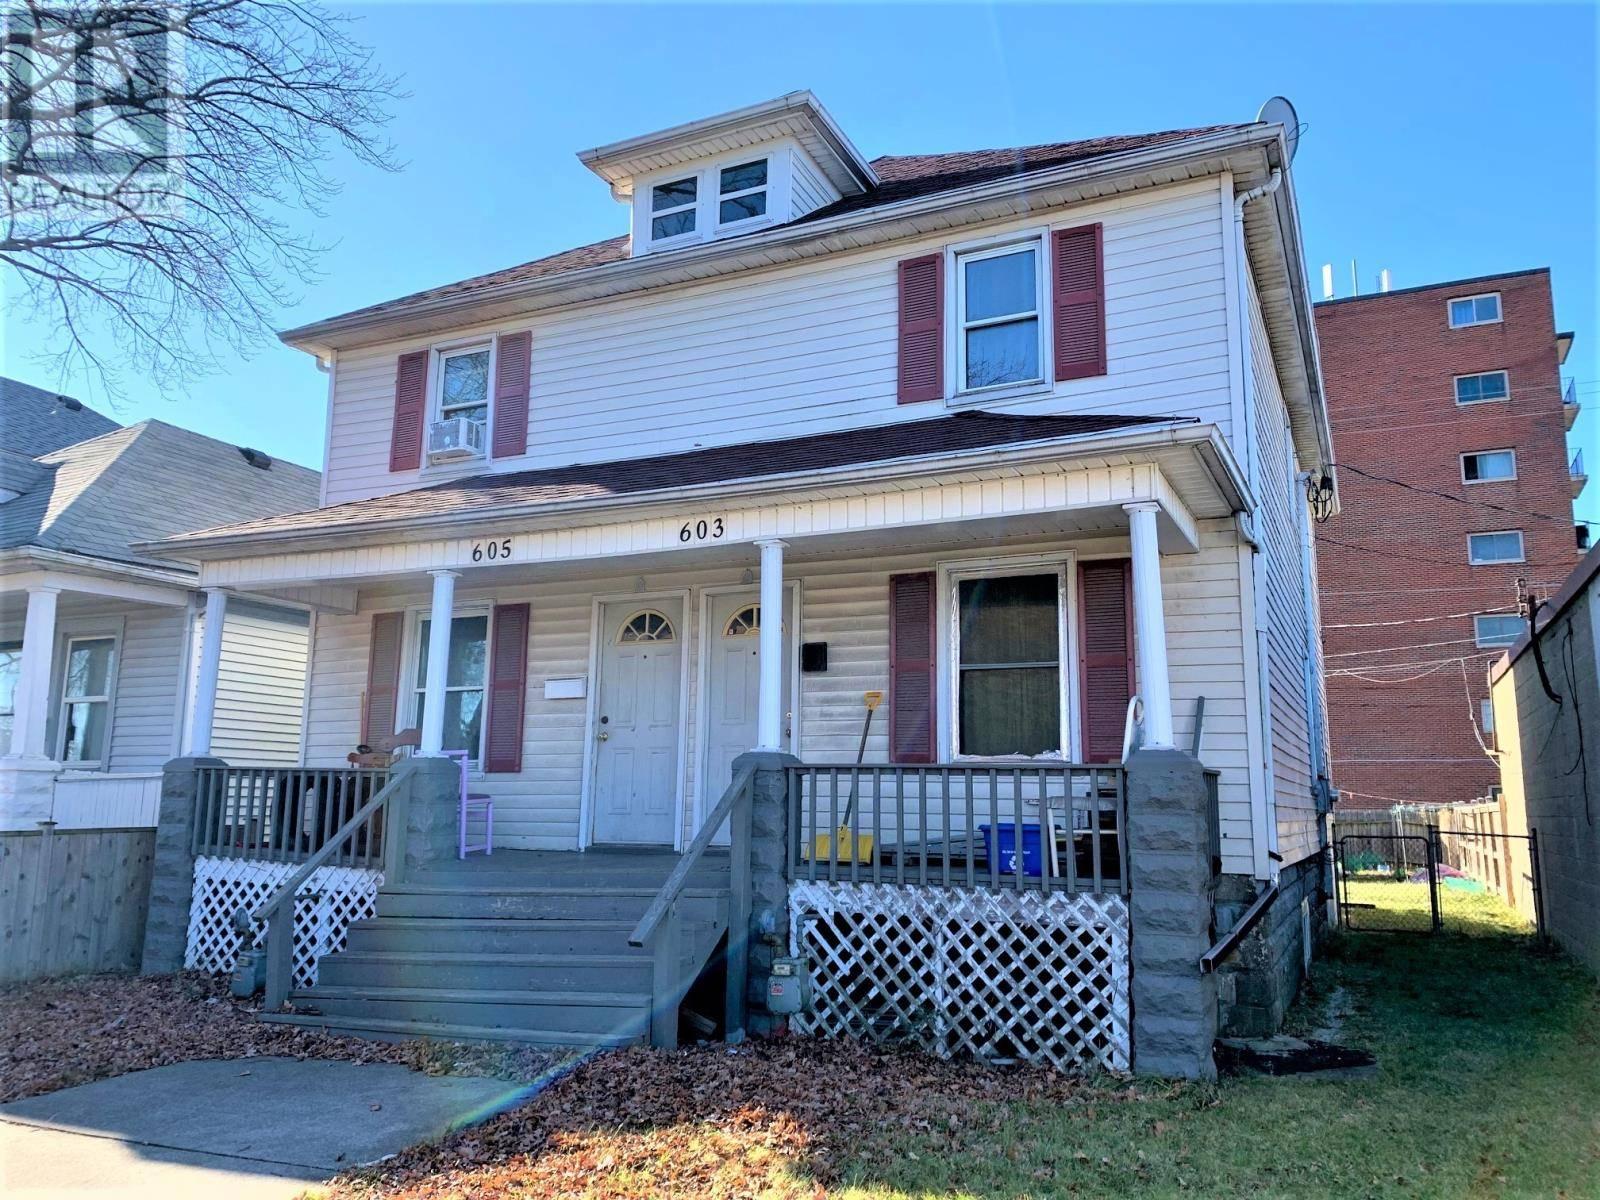 House for sale at 603 Bridge  Windsor Ontario - MLS: 20002058